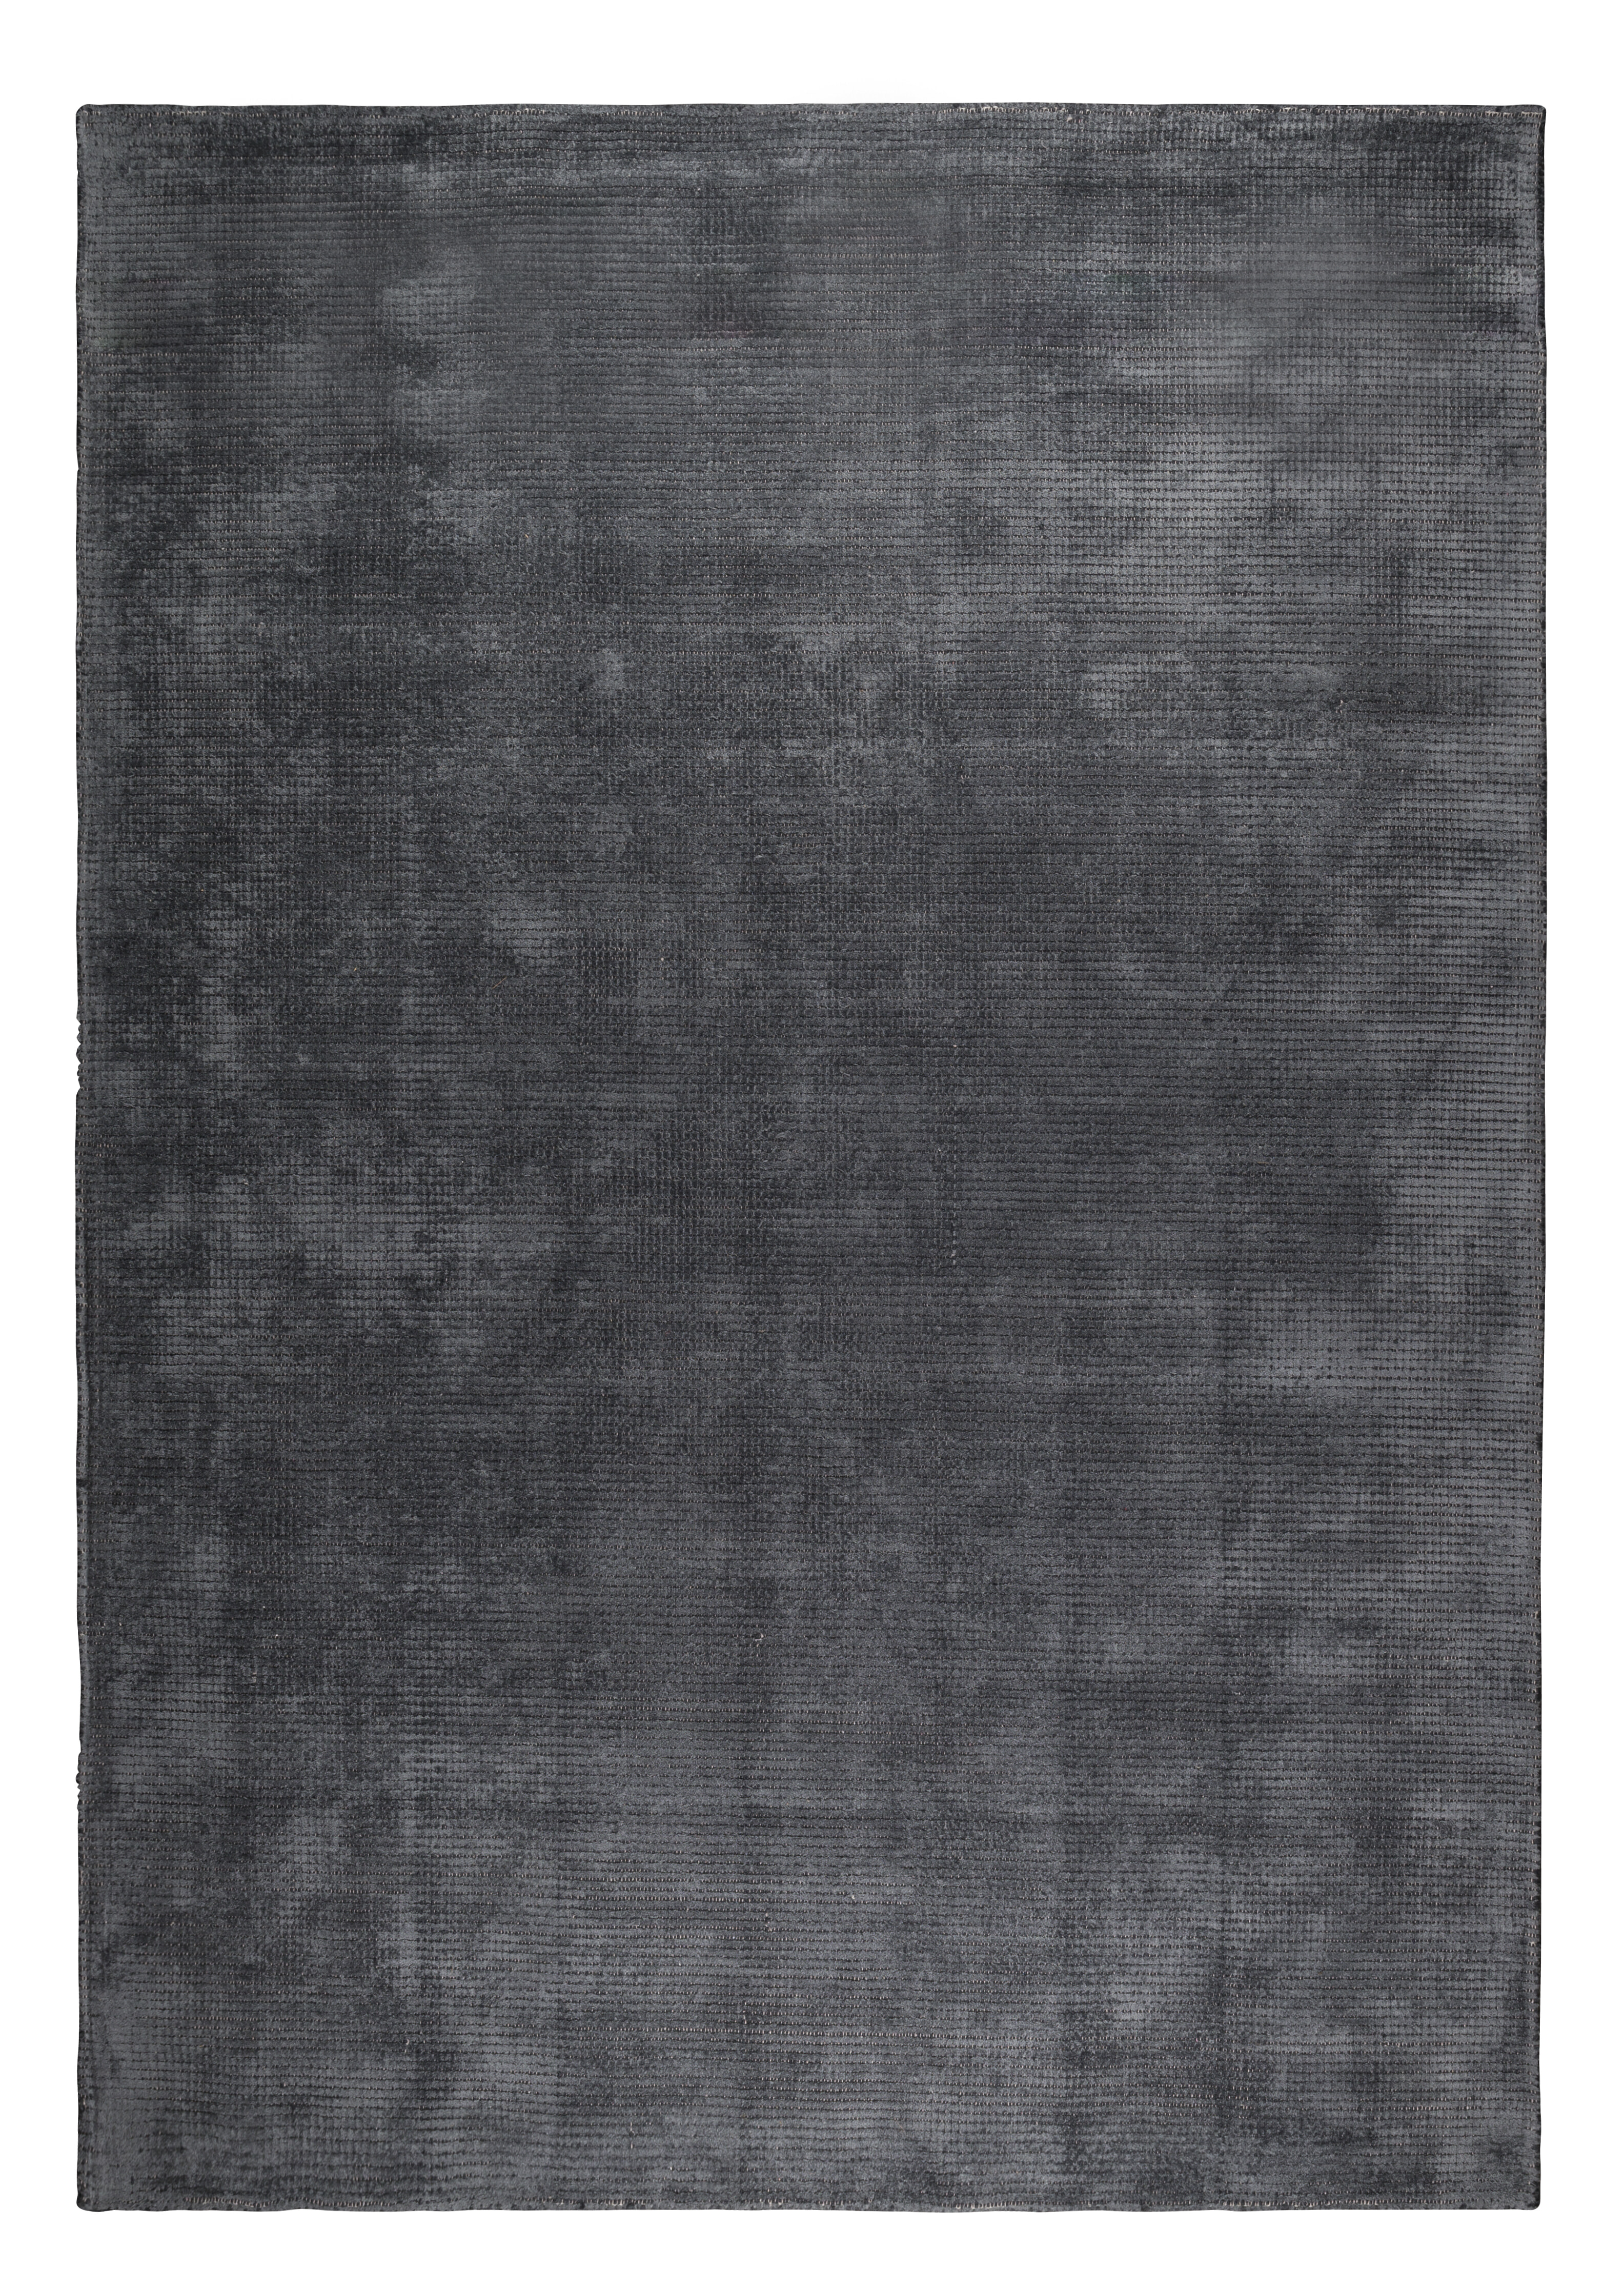 Vloerkleed 'Rymer' 170 x 240cm, kleur leigrijs